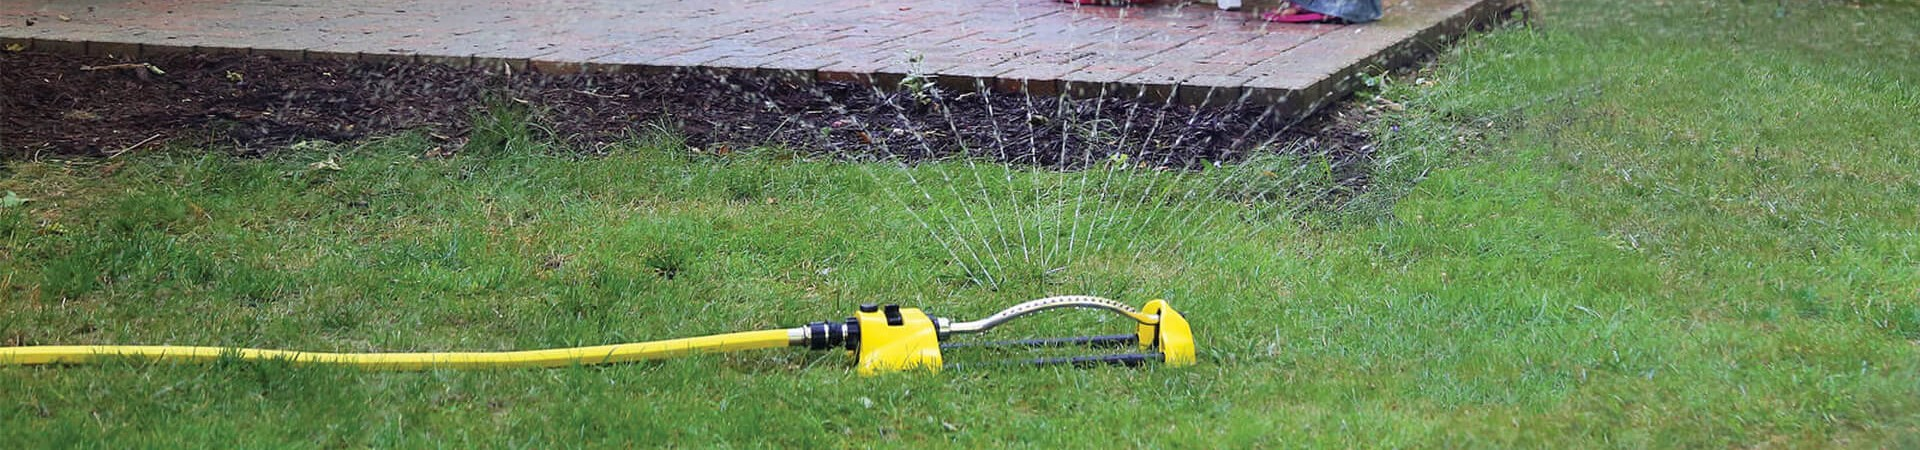 Best Oscillating Sprinklers Reviewed